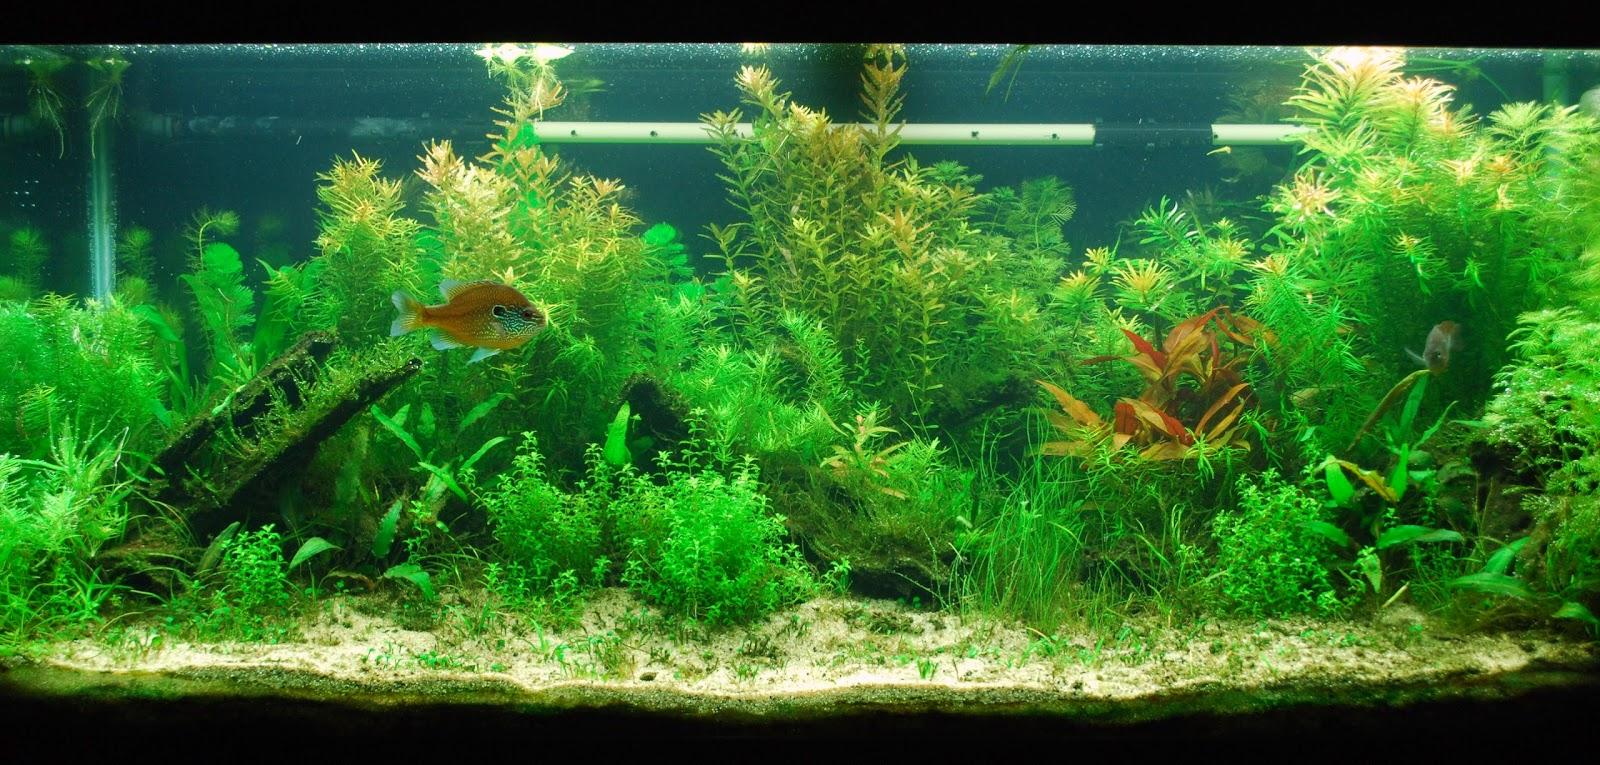 Combining Elements Of AmanoTakashiu0027s Nature Aquarium, Diana Walstadu0027s  Natural Planted Aquarium, And The Japanese Igwami Styles I Create Focussed  Aquascapes ...